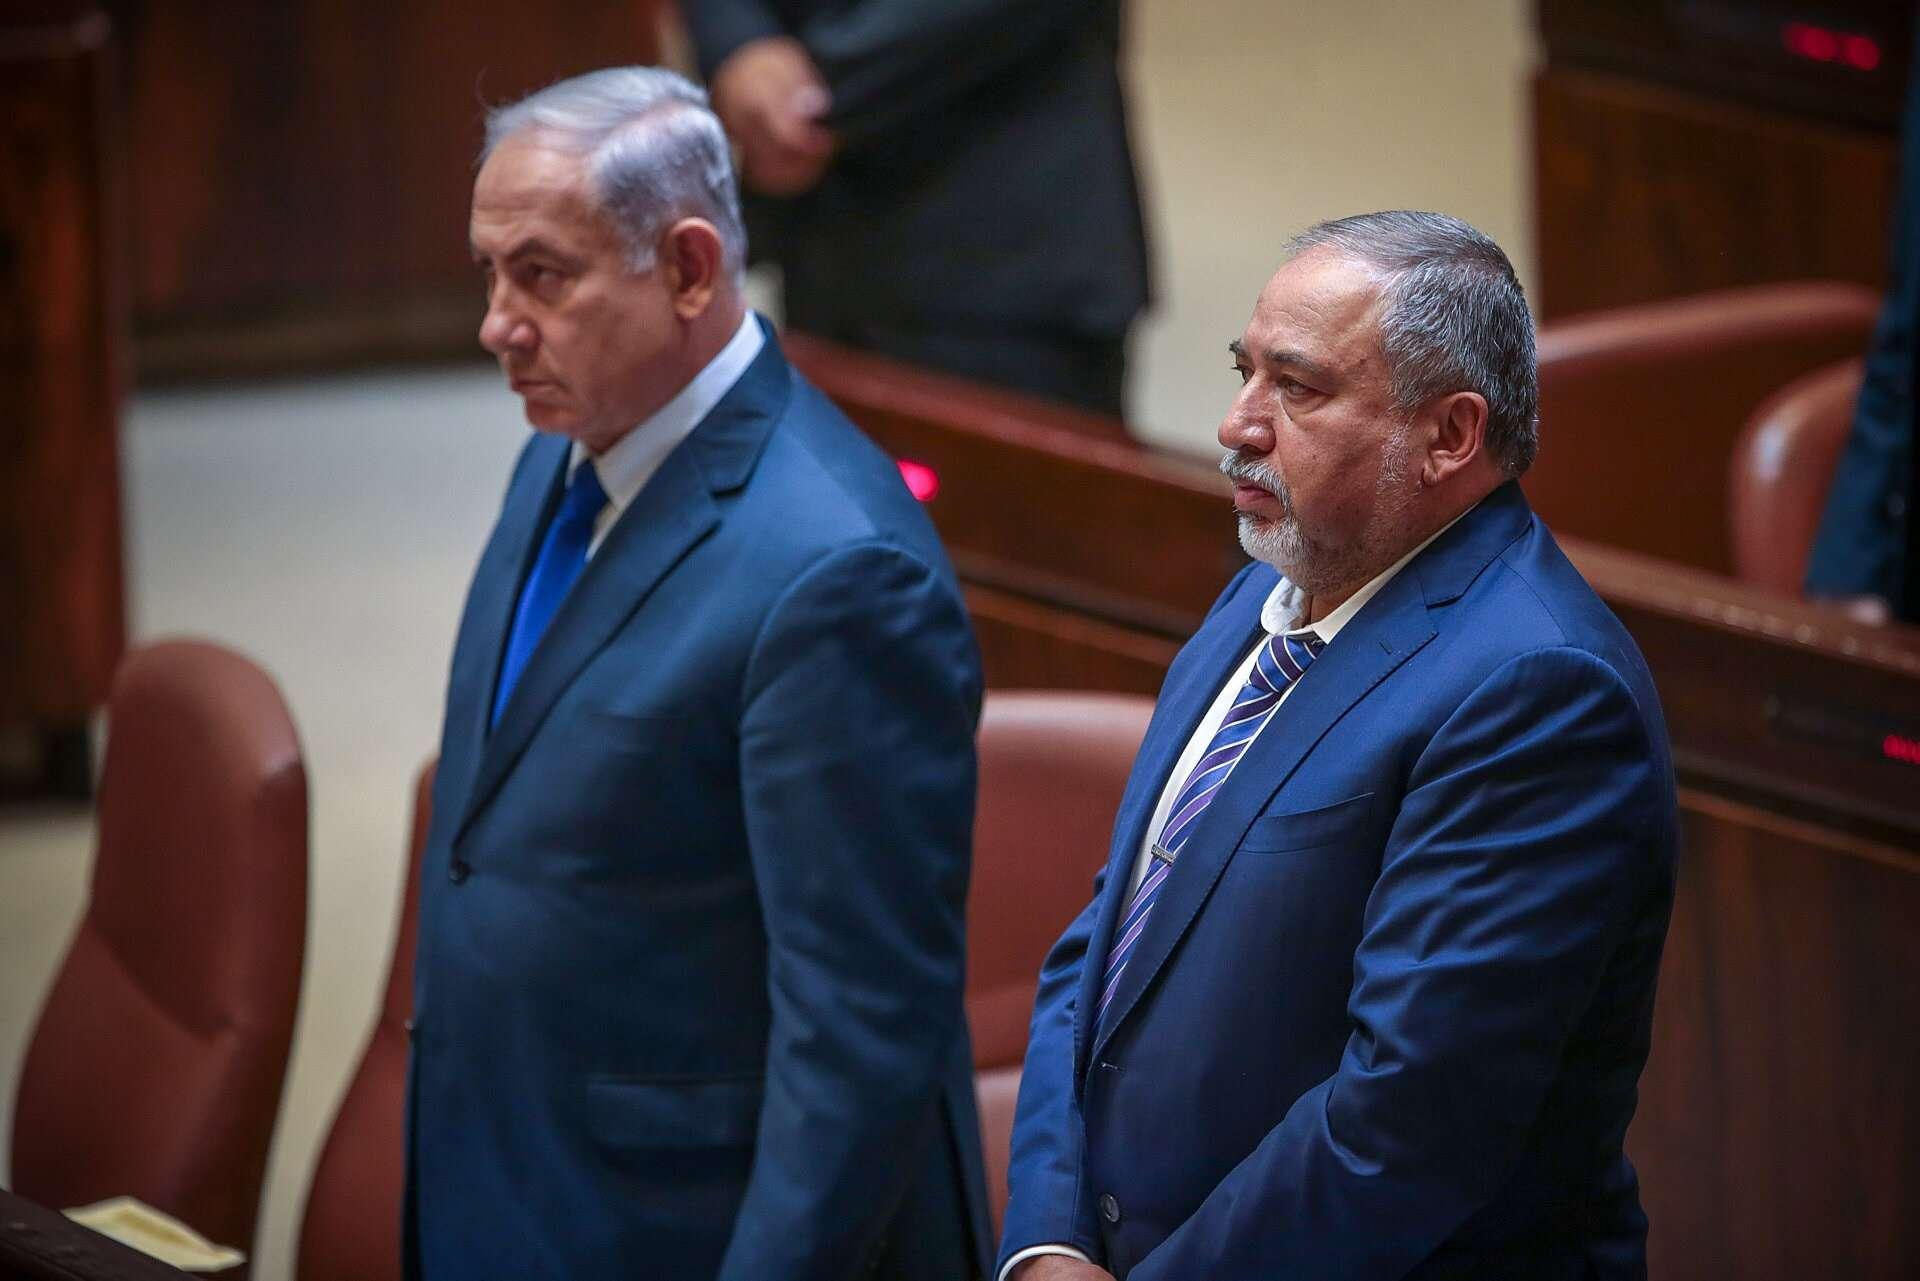 Knesset election tentatively set for September as coalition